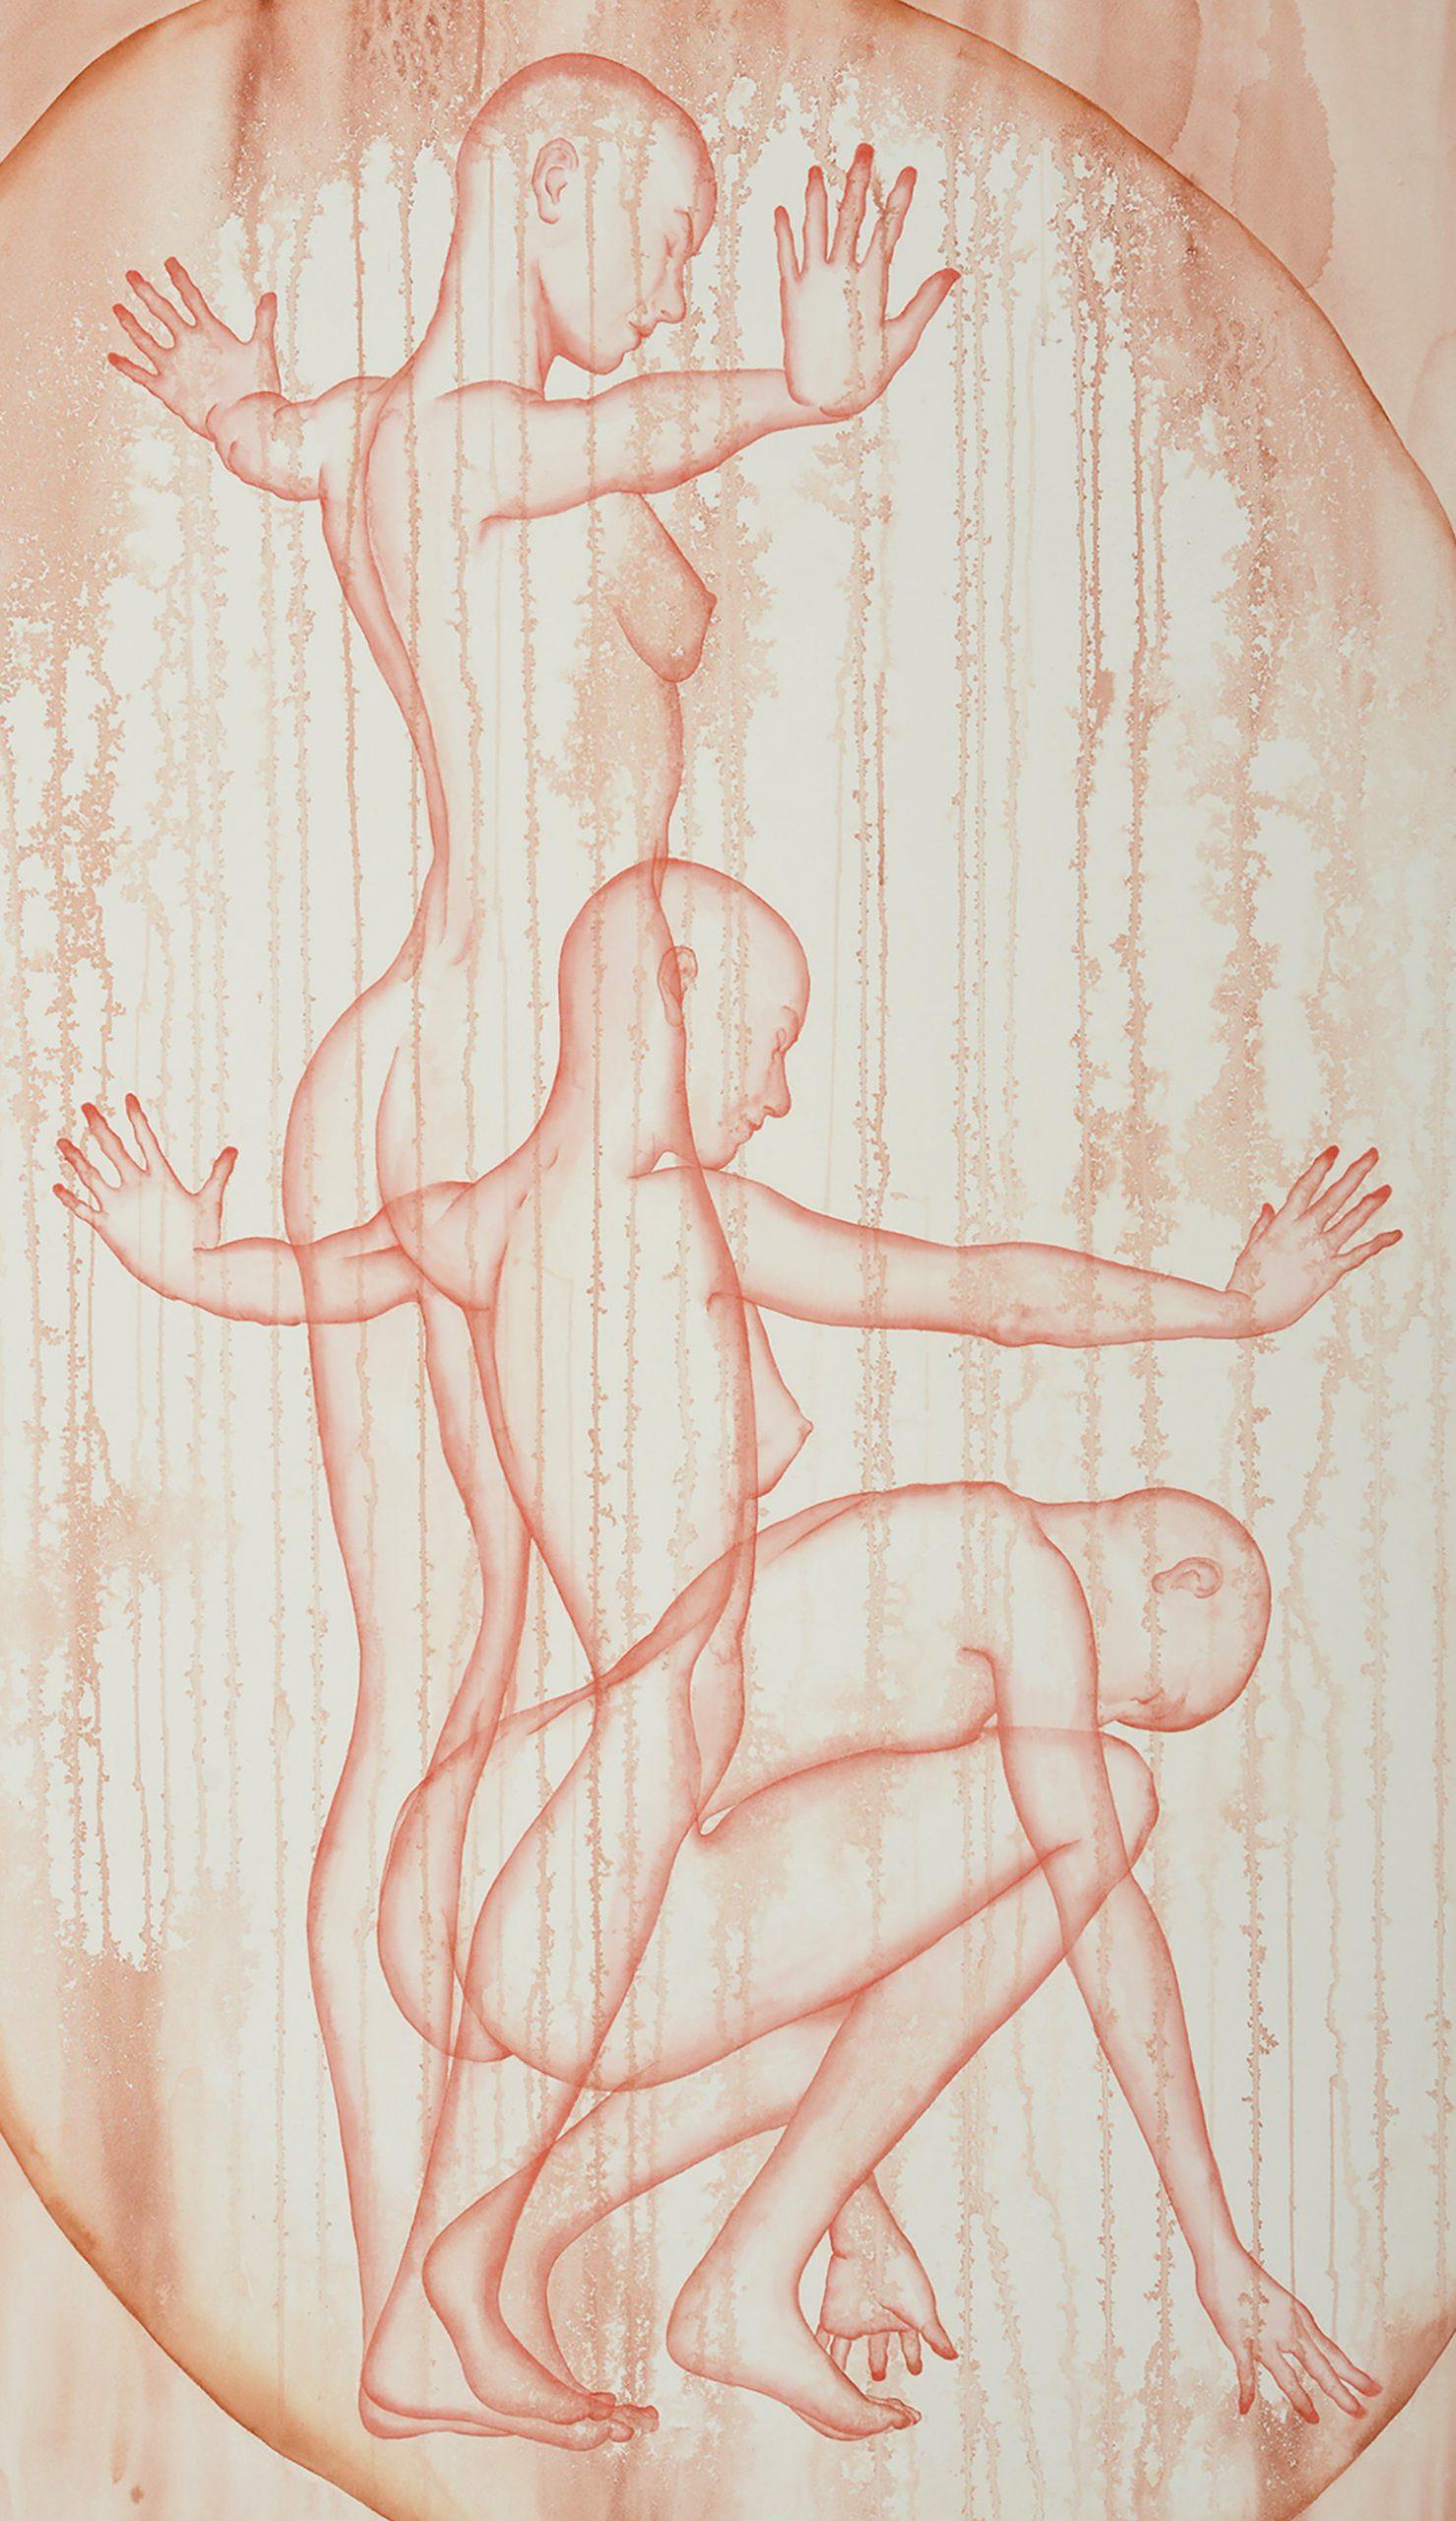 Stefano Bolzano, Aura sentimentale, watercolor on paper, 90x145 cm, 2020 (detail).